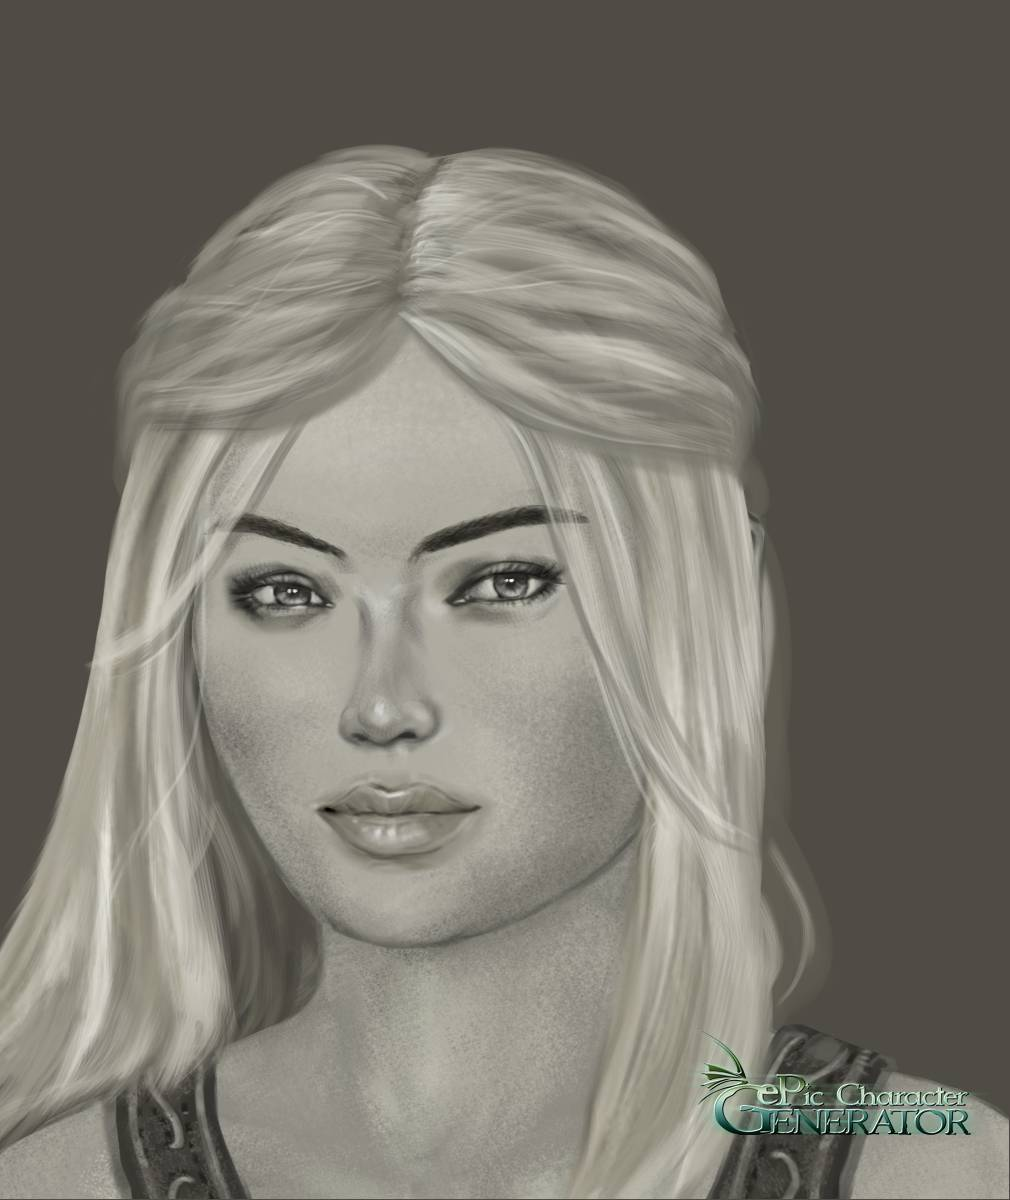 ePic Character Generator Season 3 Female Portrait Screenshot 03